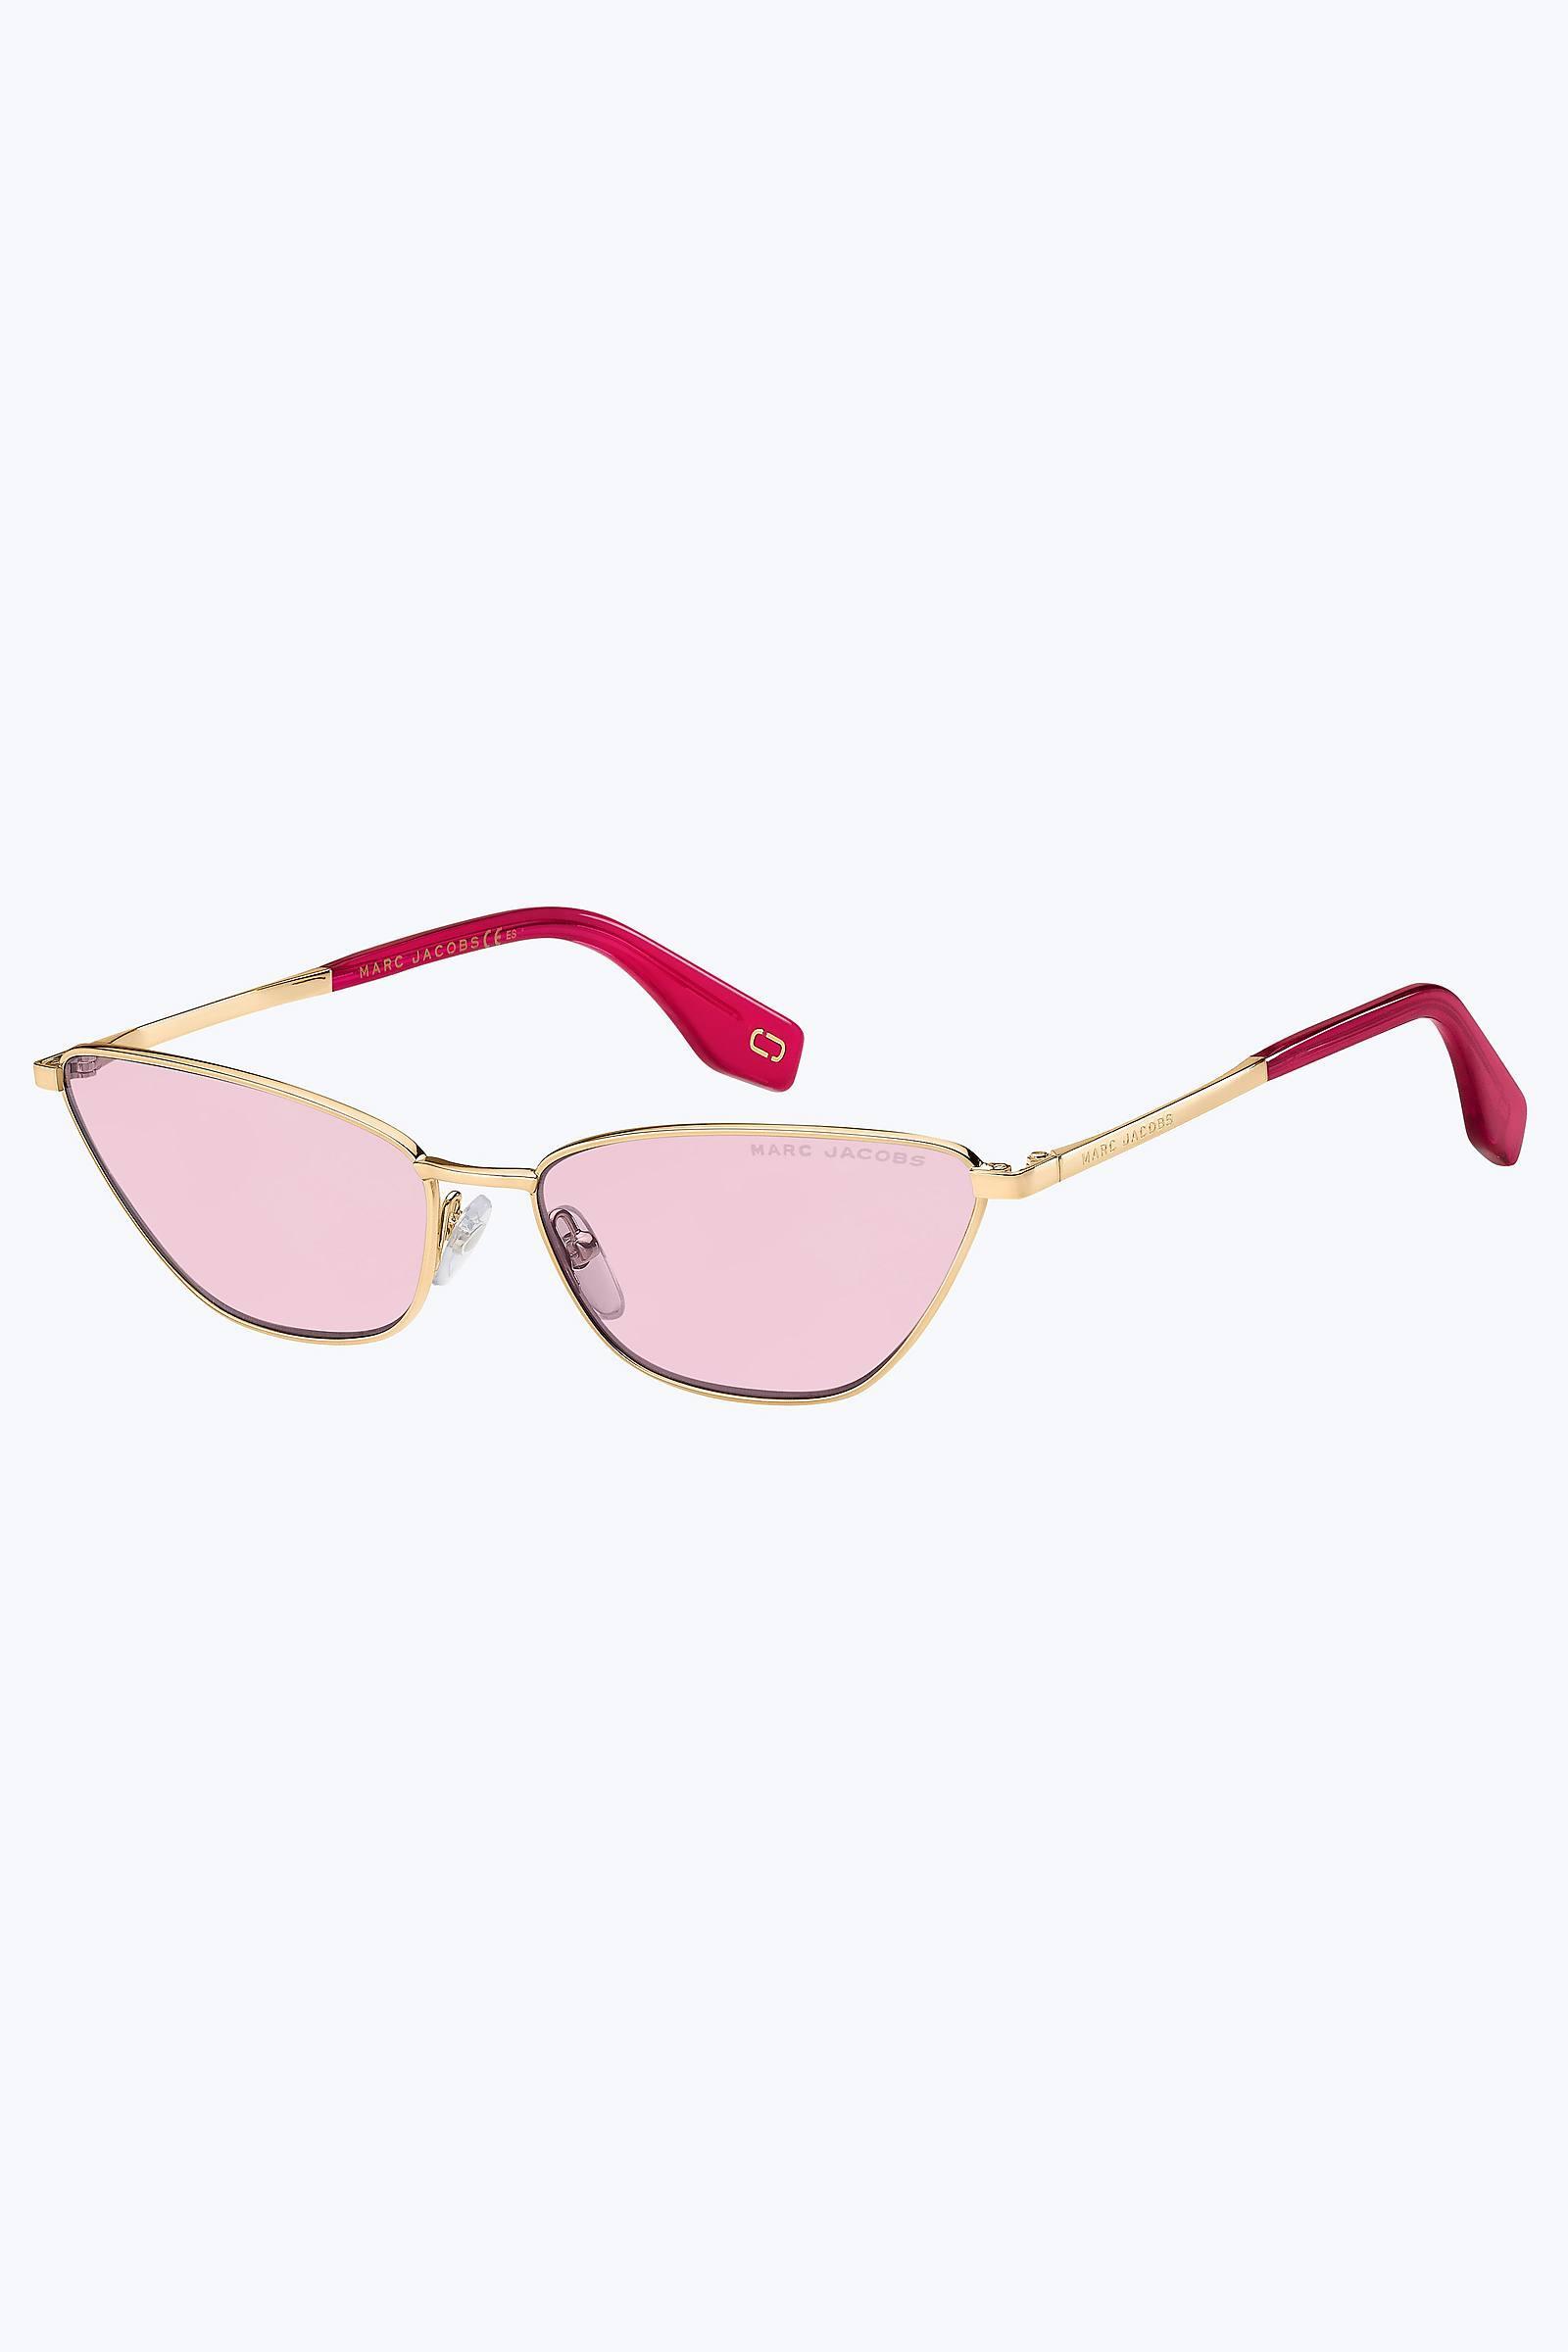 947d5ec64624 Marc Jacobs Retro Vintage Mini Cat-eye Sunglasses in Pink - Lyst